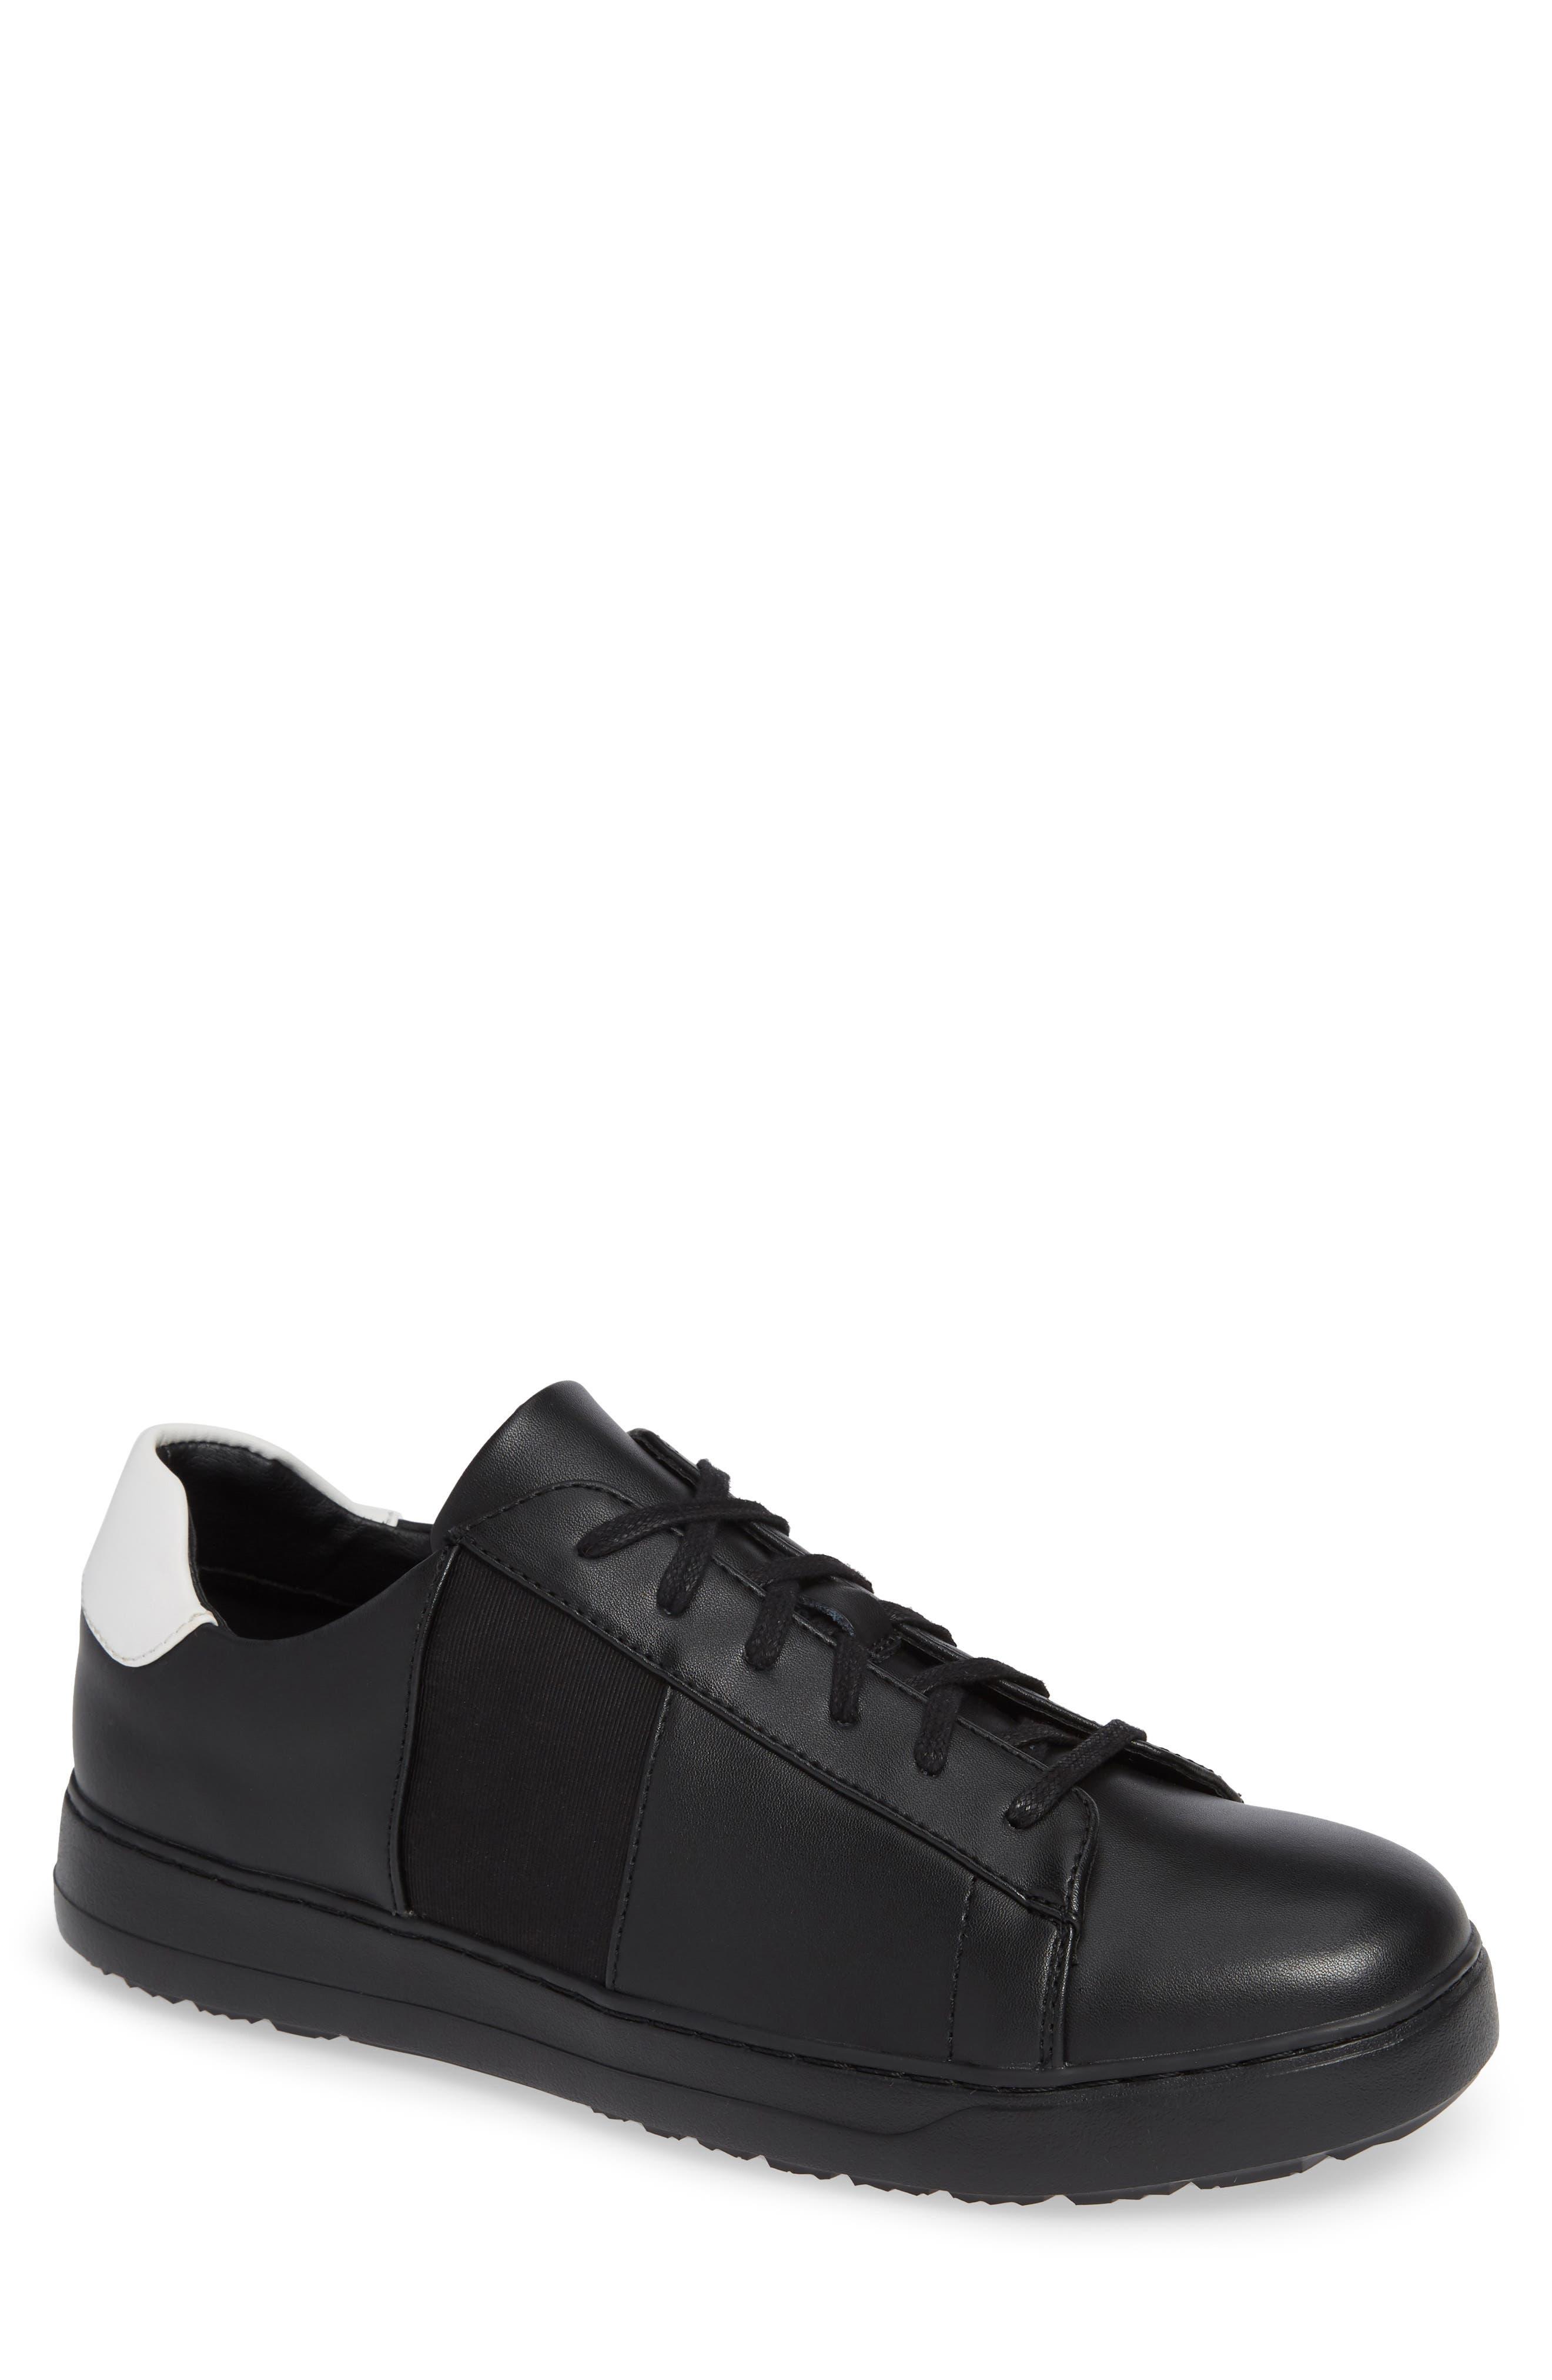 Sammy 2 Sneaker,                             Main thumbnail 1, color,                             BLACK LEATHER